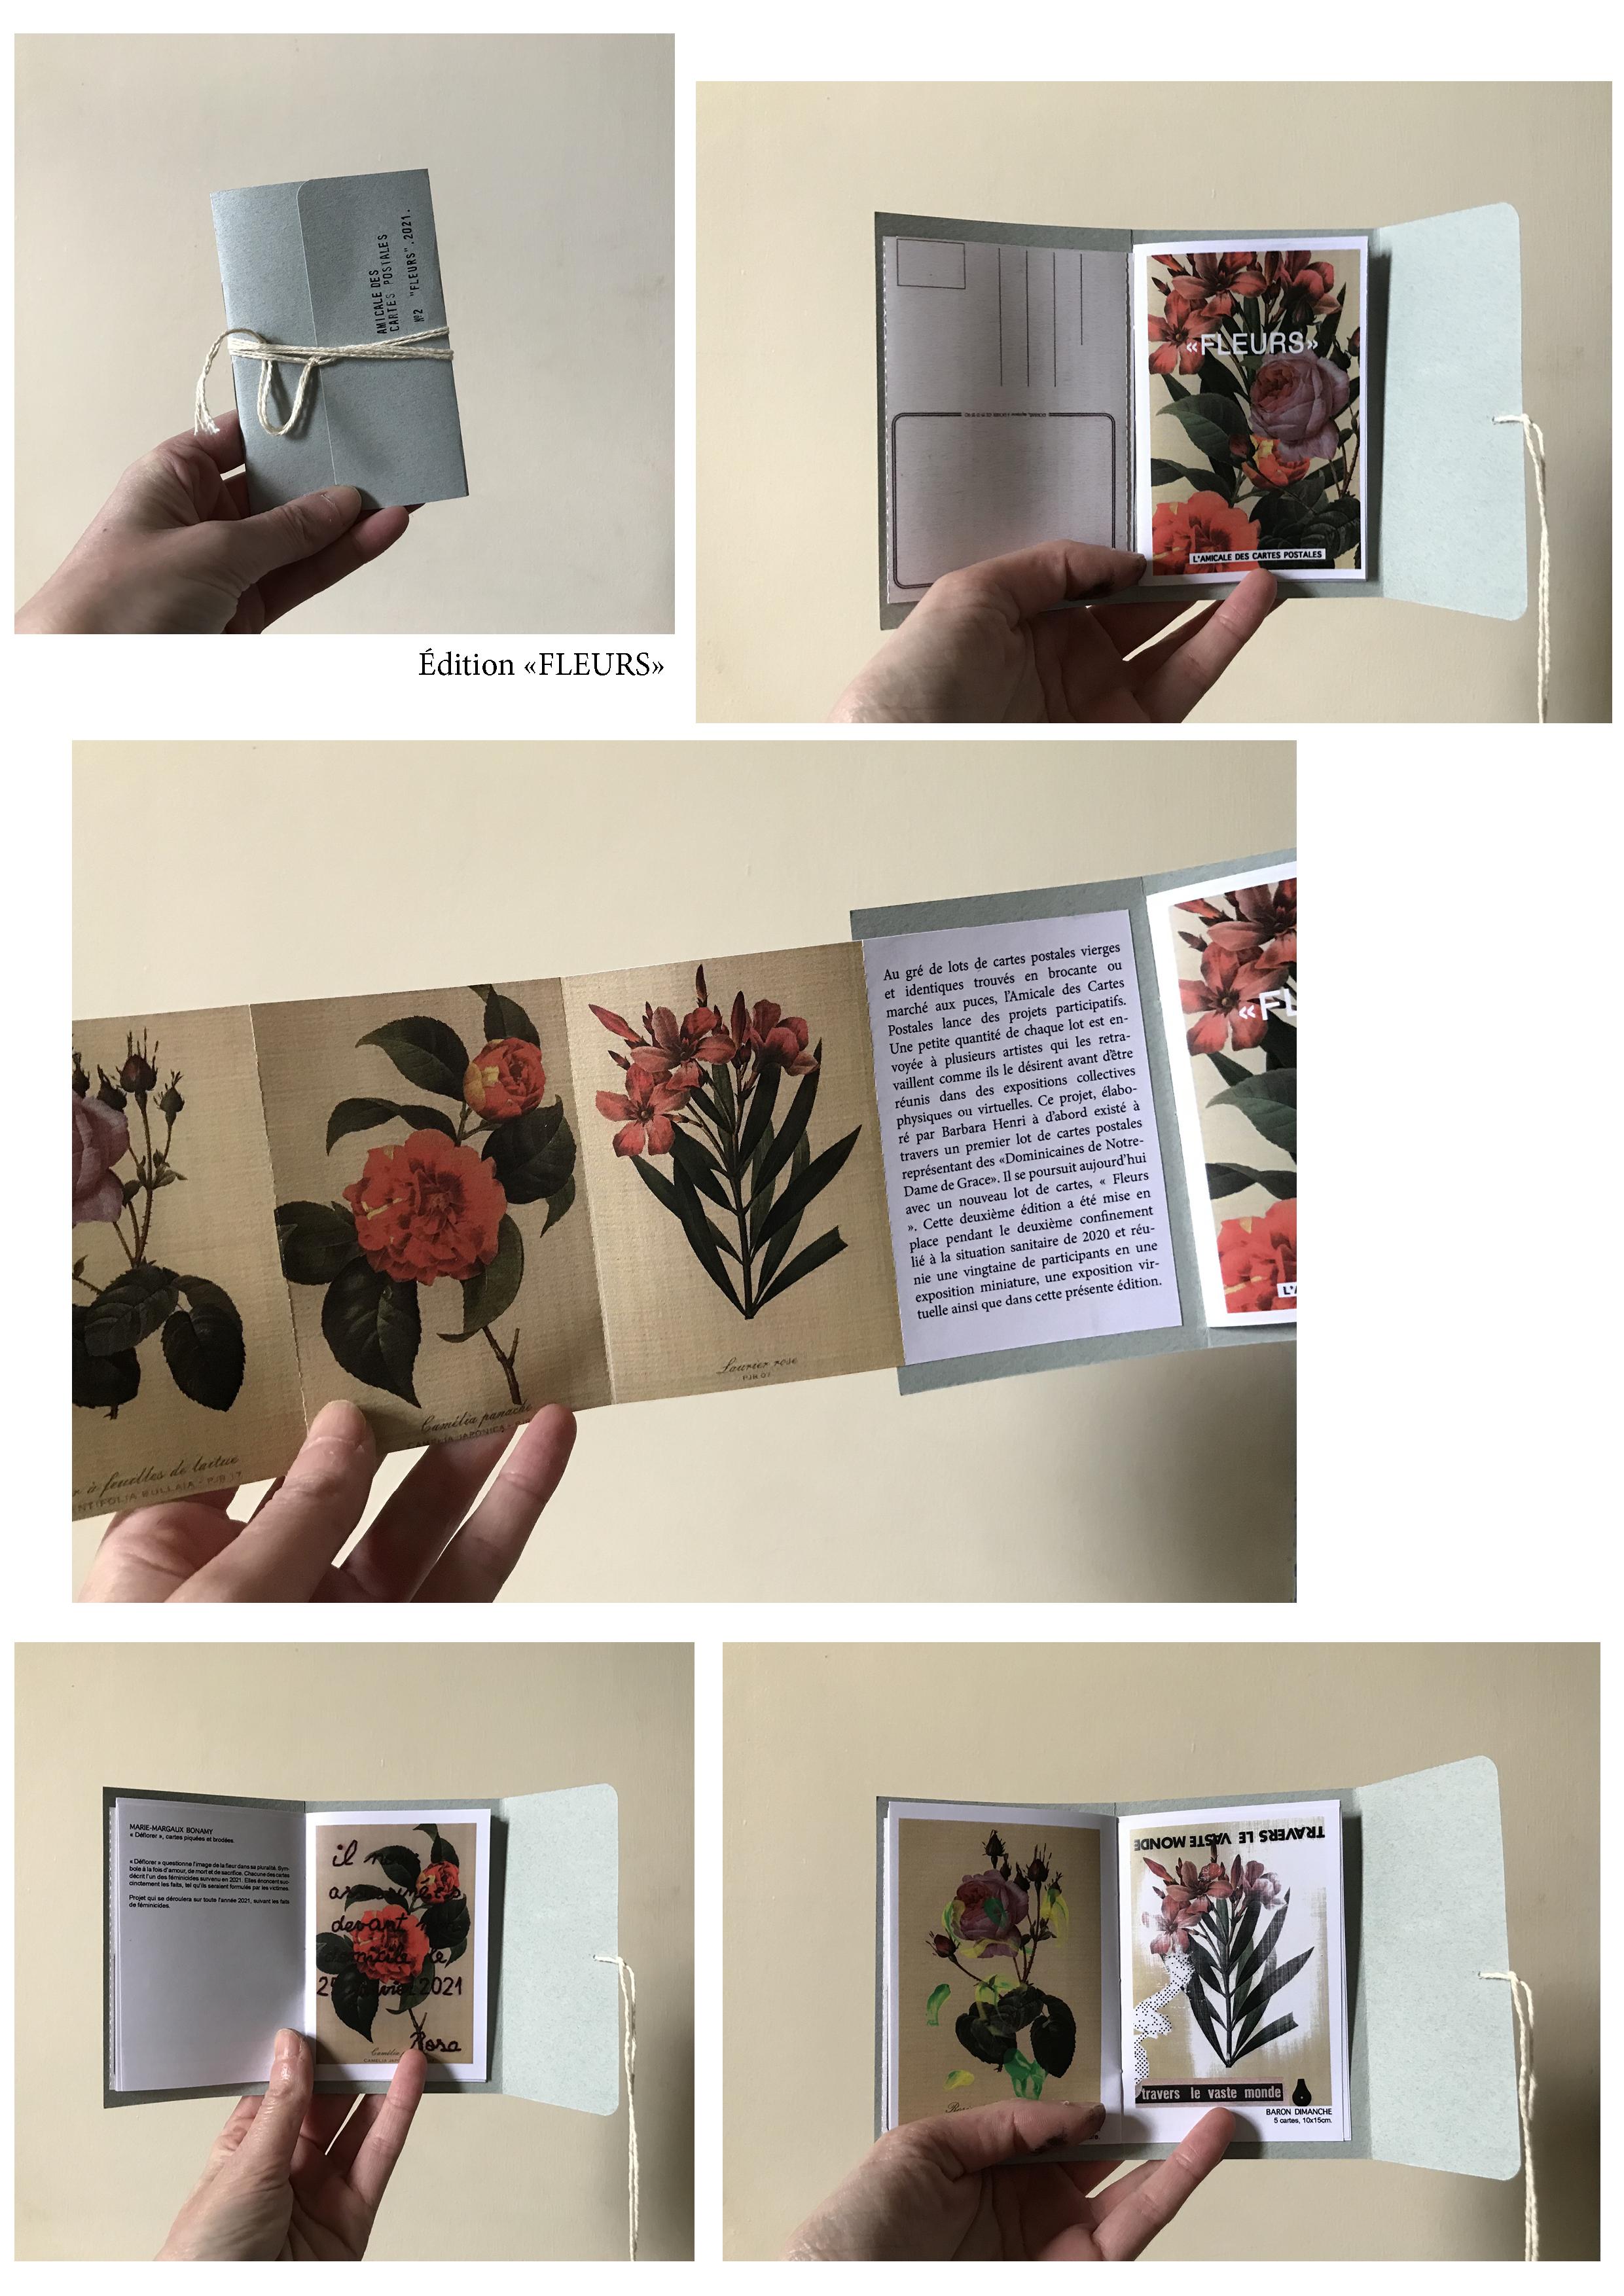 edition mep fleurs